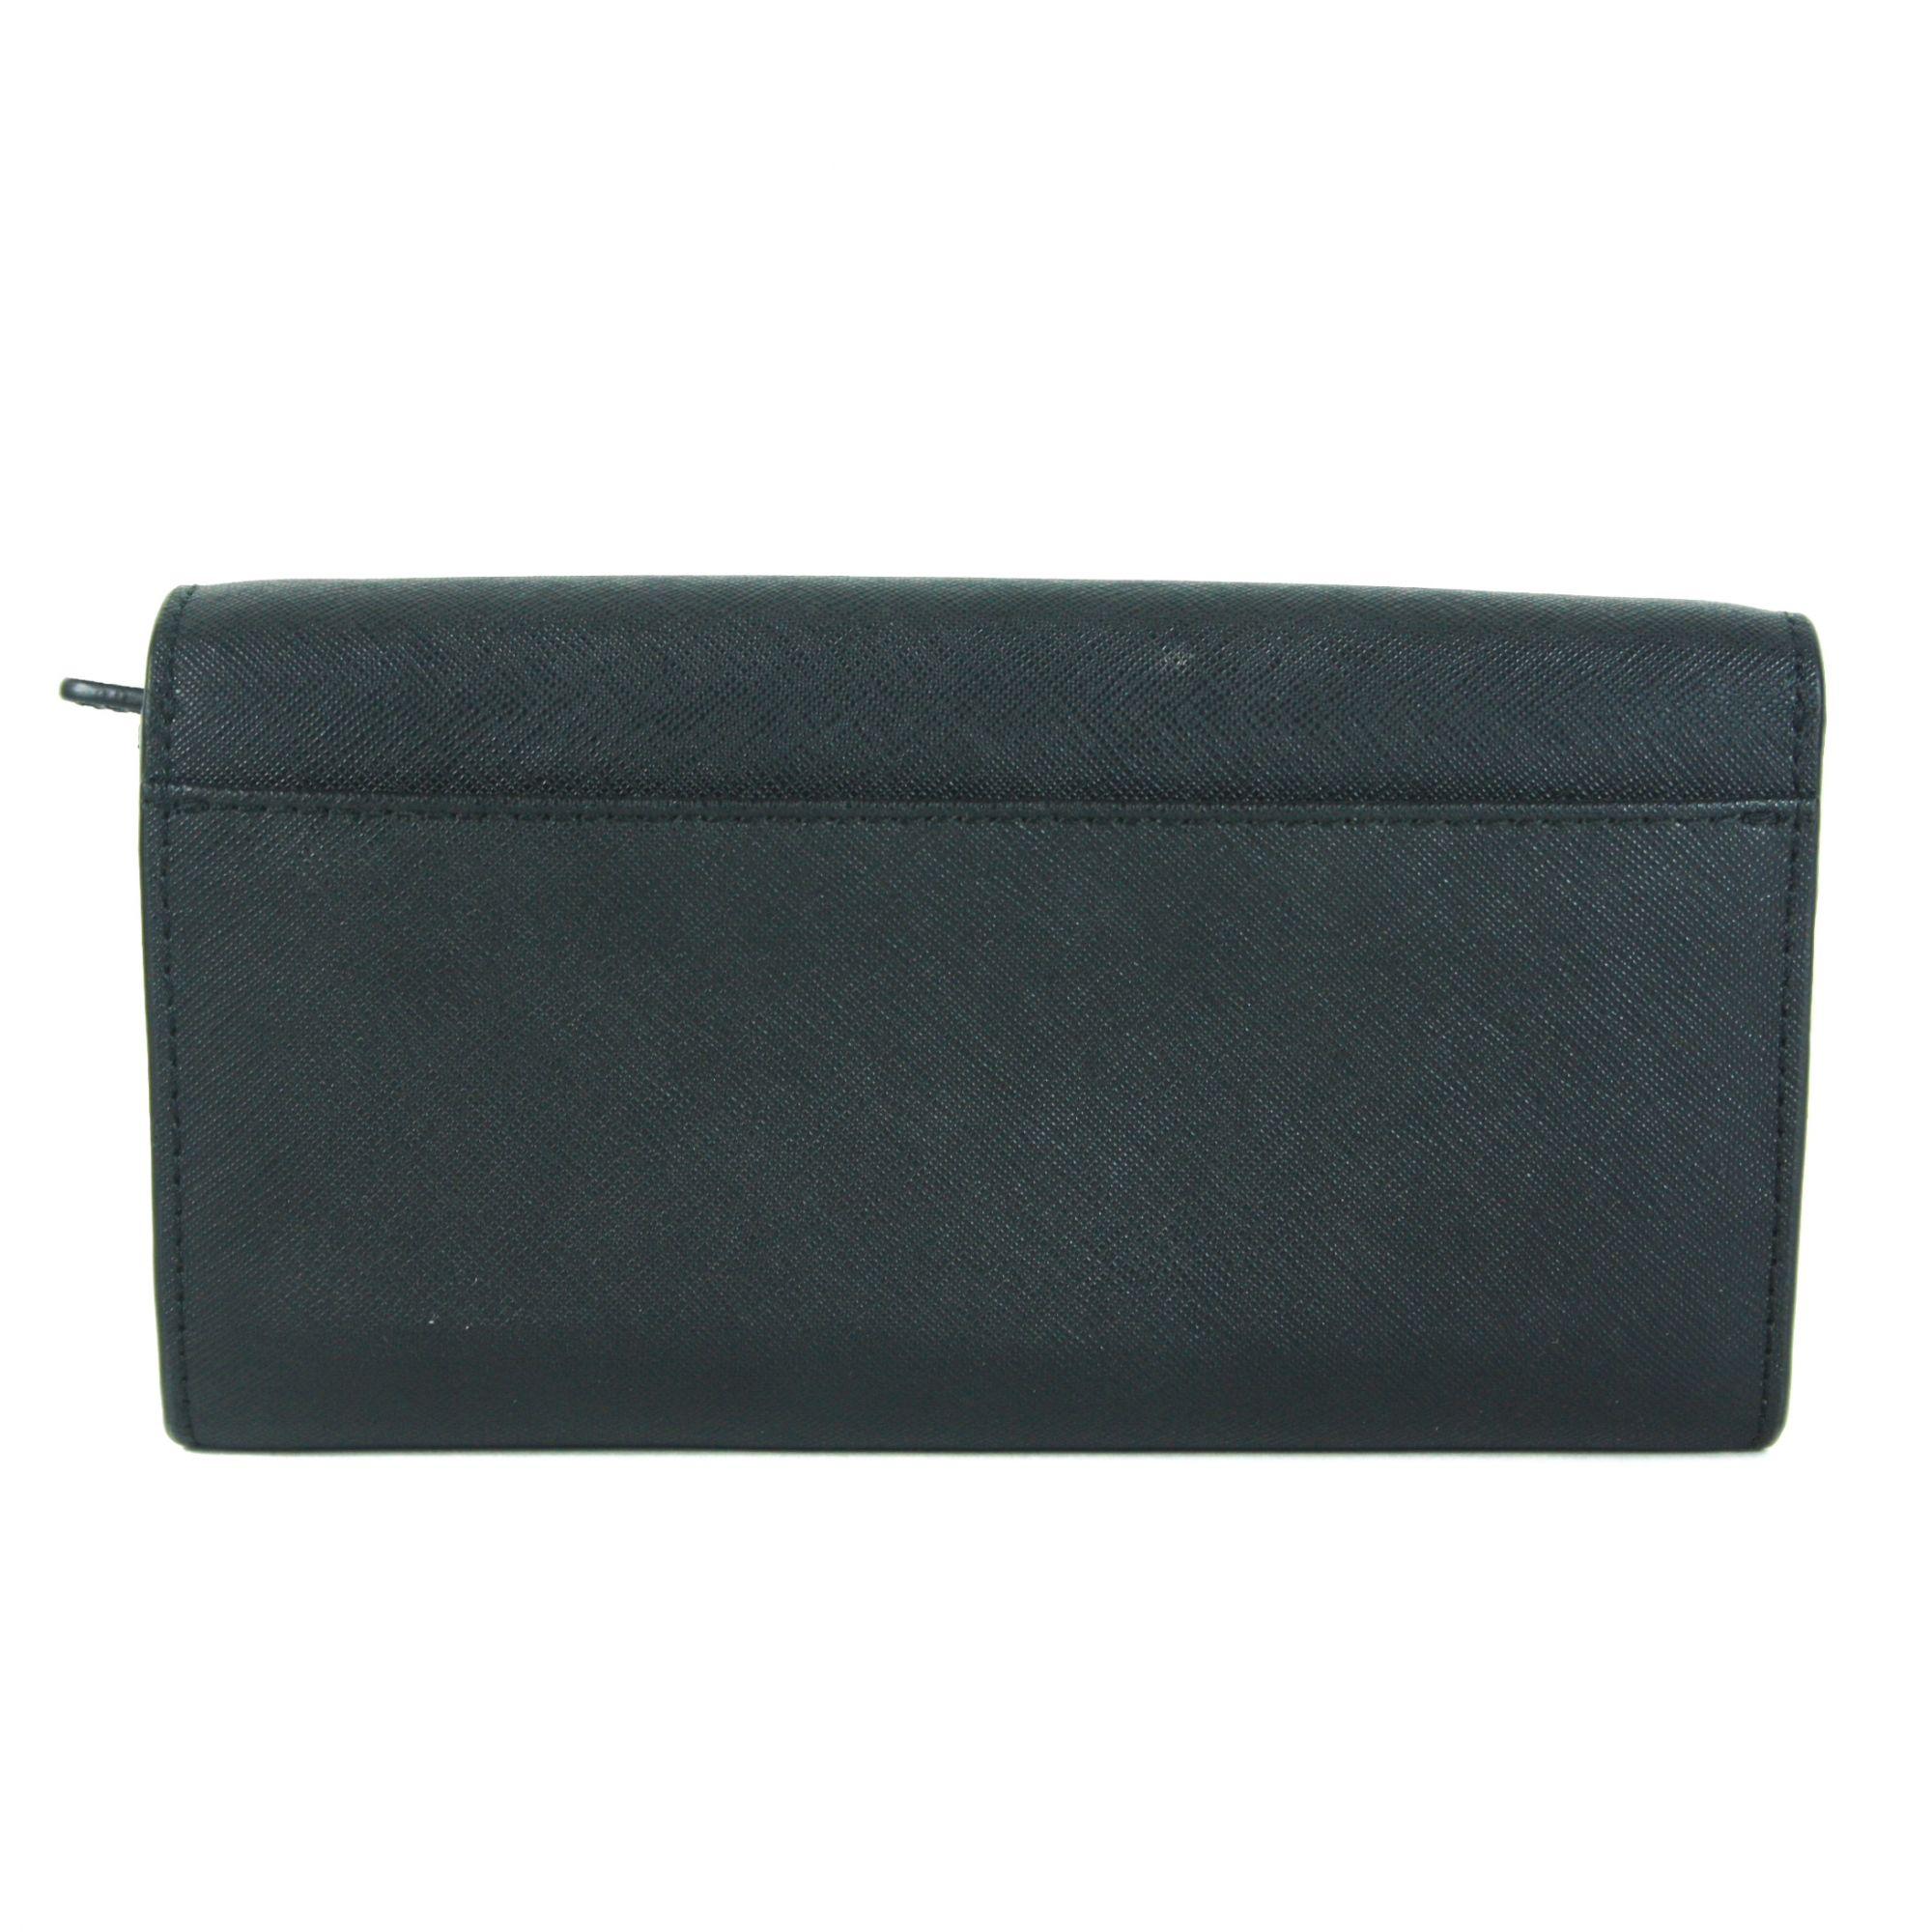 Jet Set Travel Black Saffiano Leather Wallet